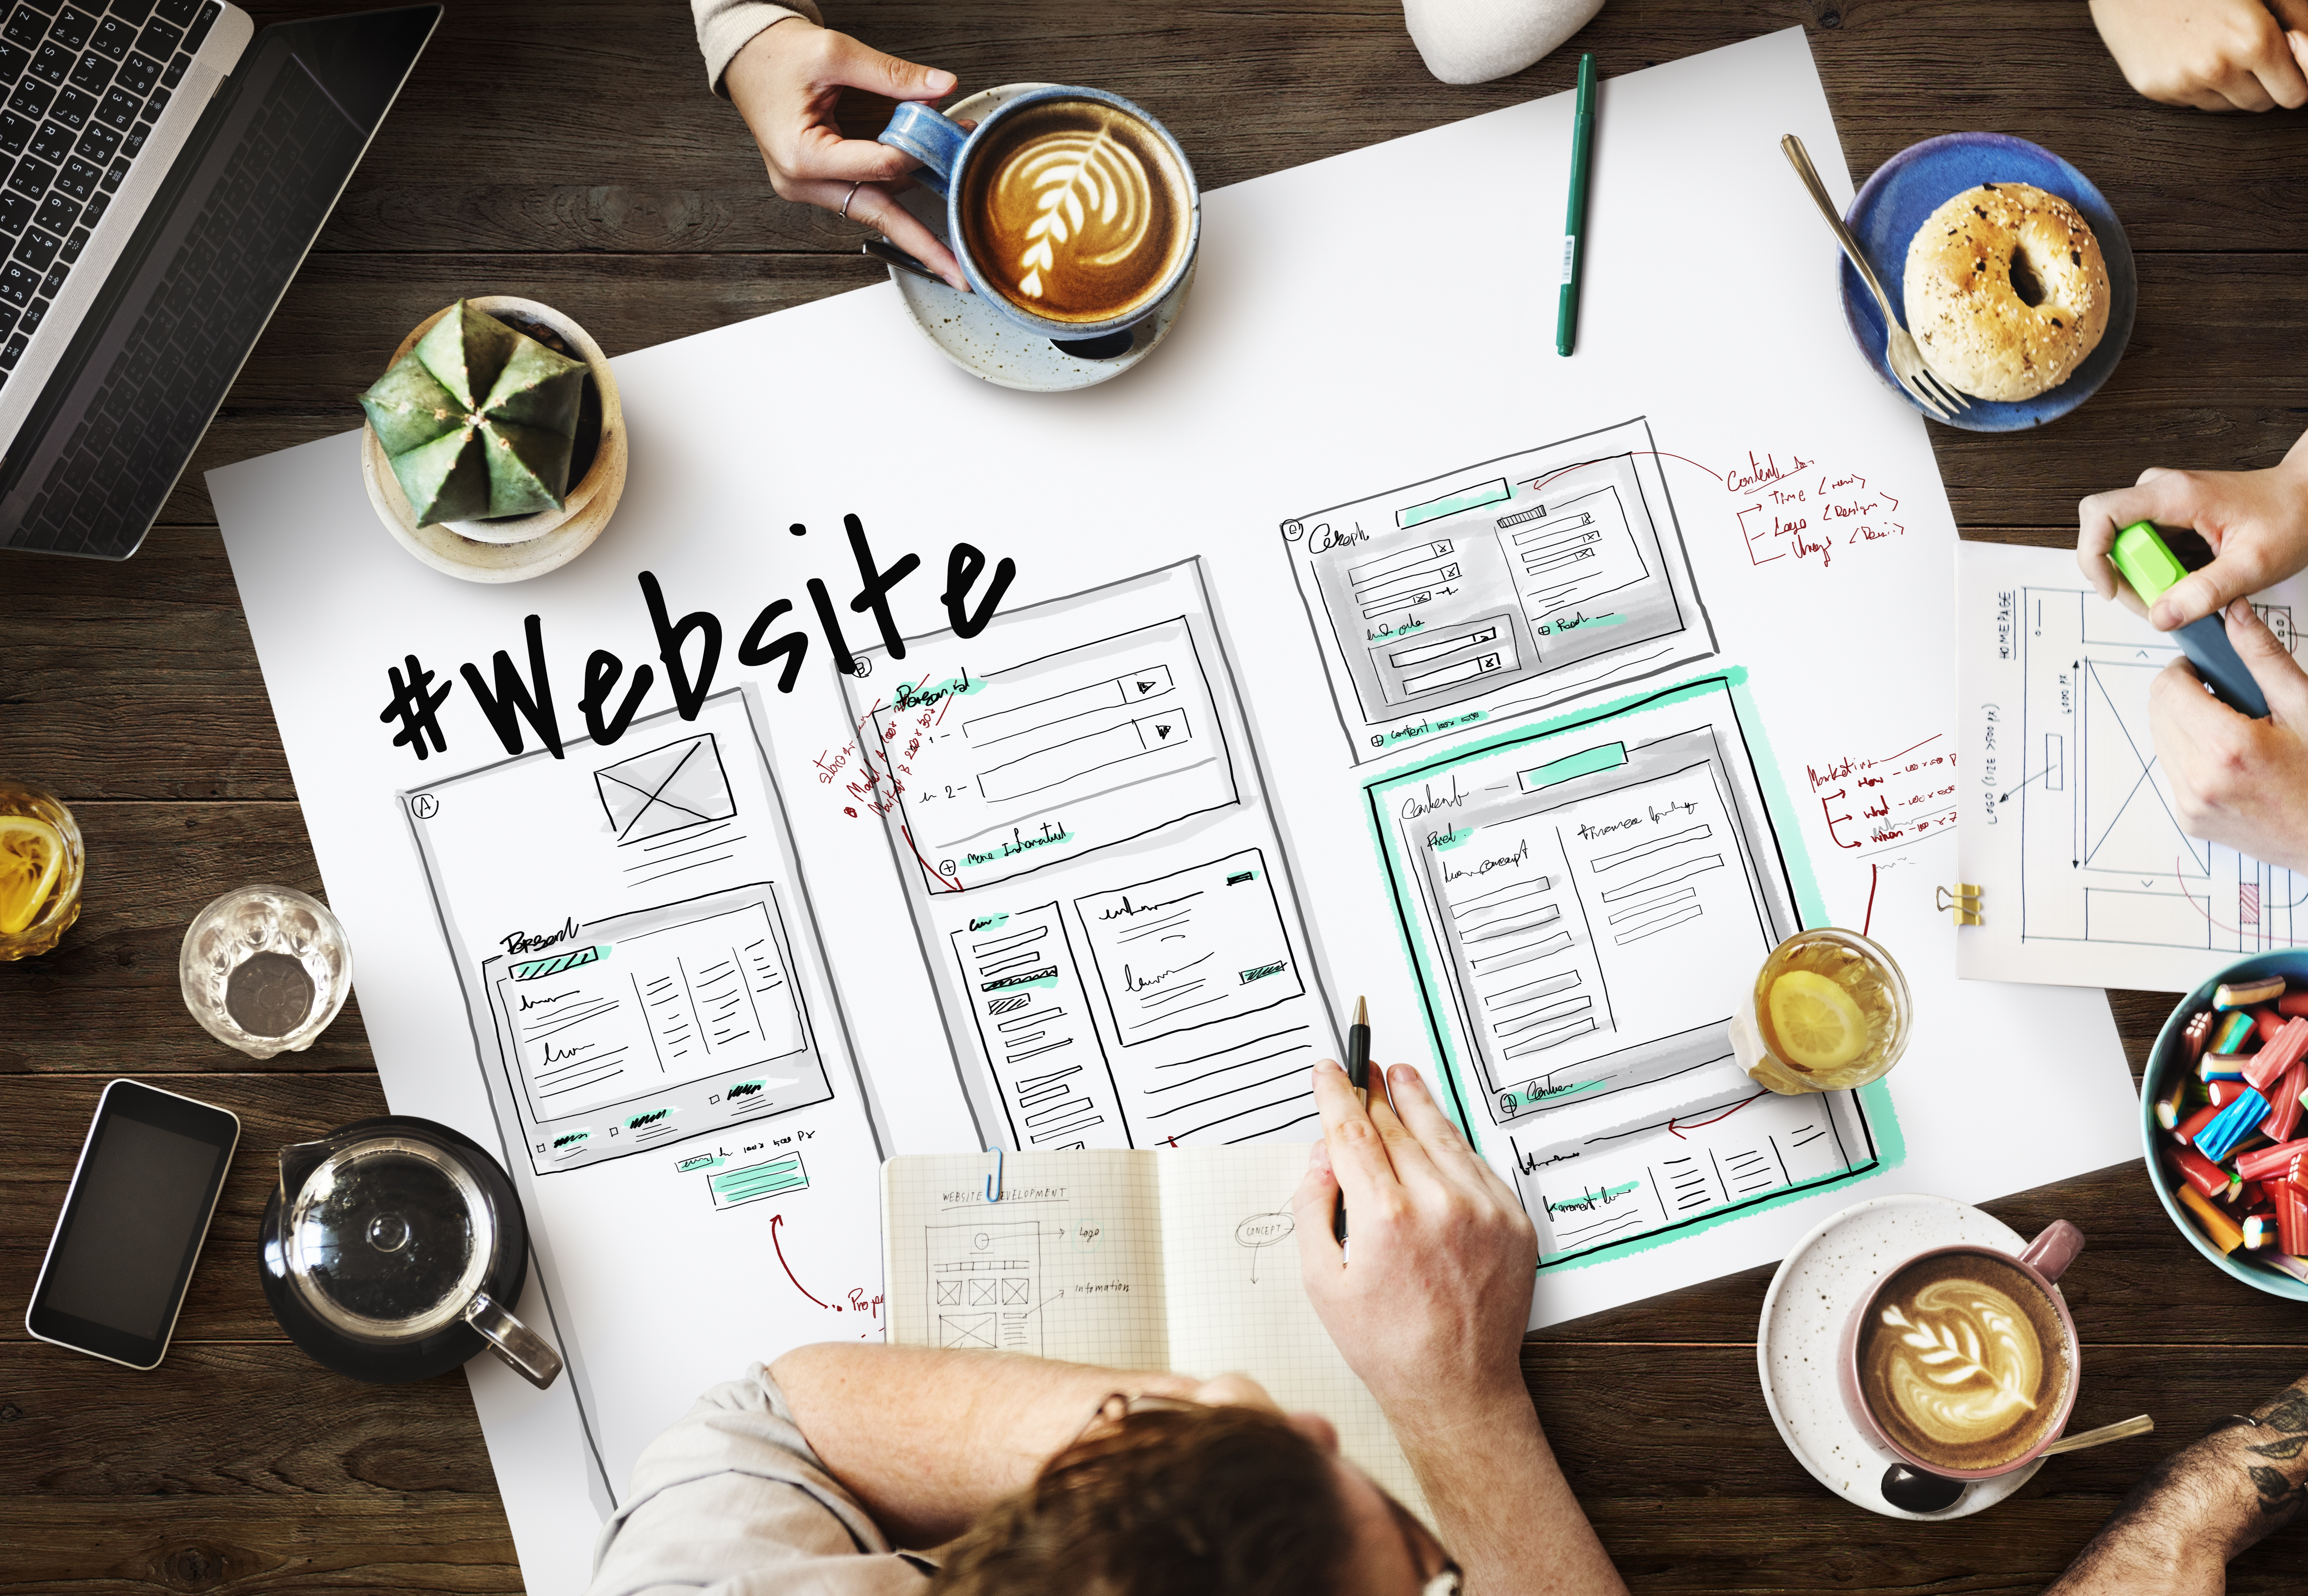 4 Ways to Check Your Website Optimization | Rhino Digital Media